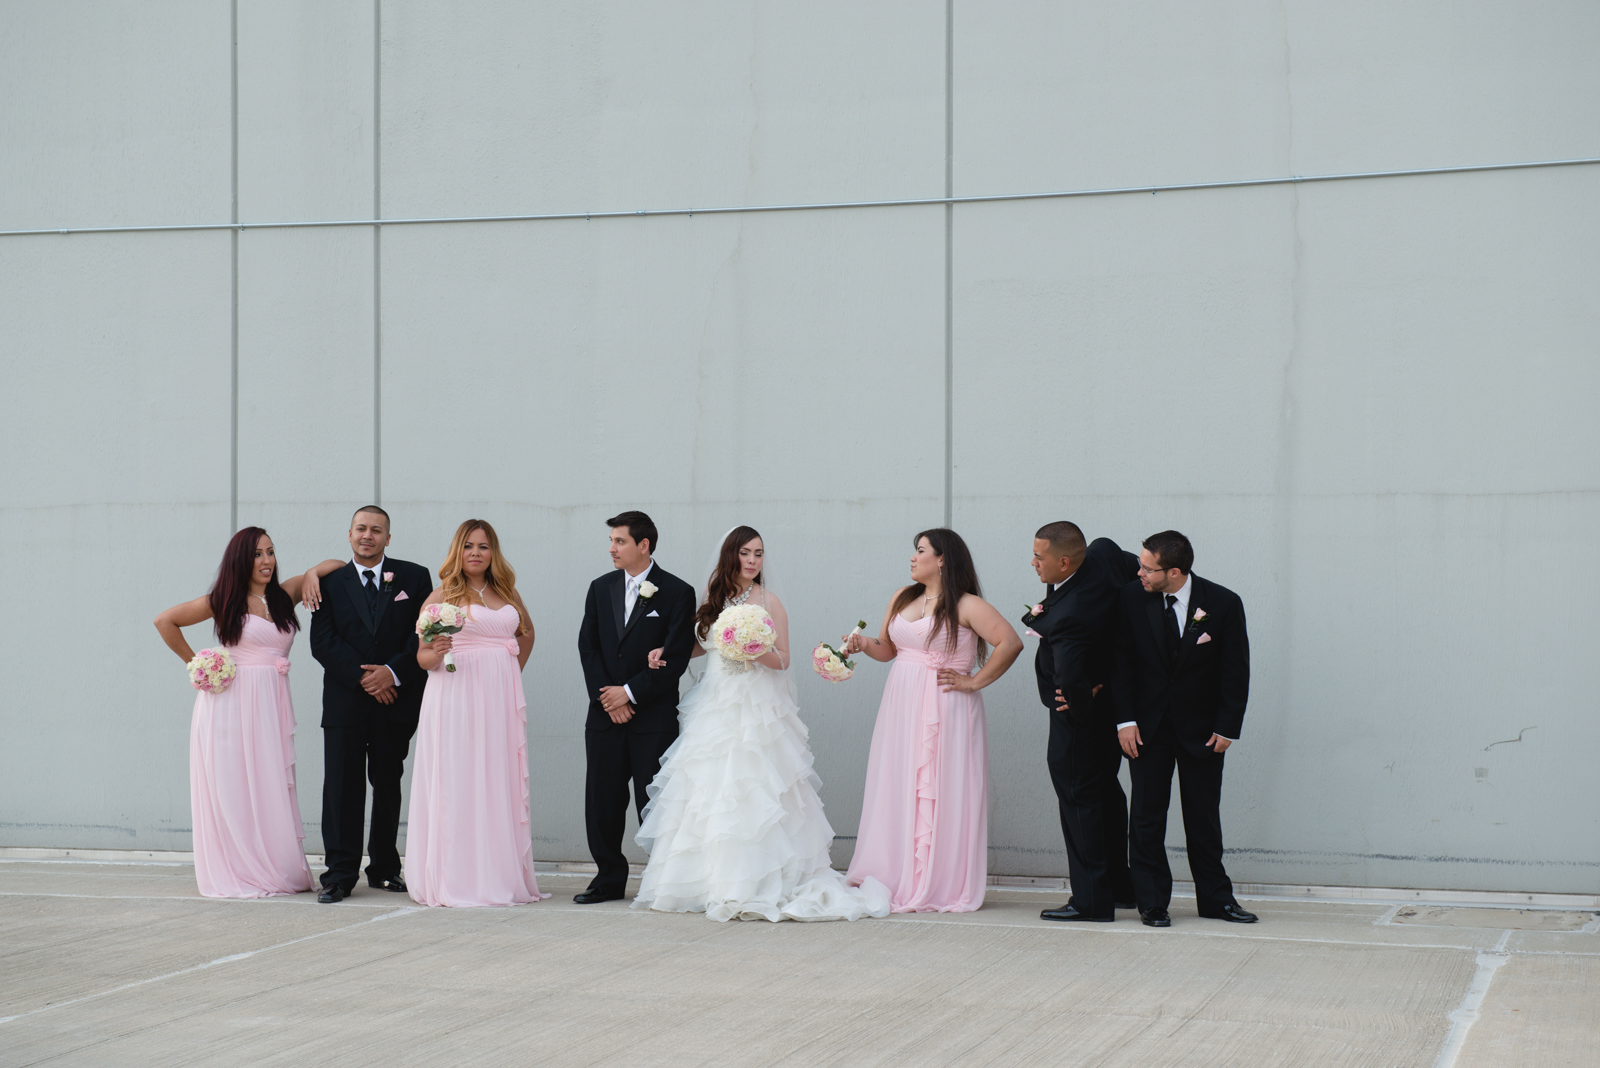 20130802-Jessica & Alex's Wedding-150-BlogEdit.JPG